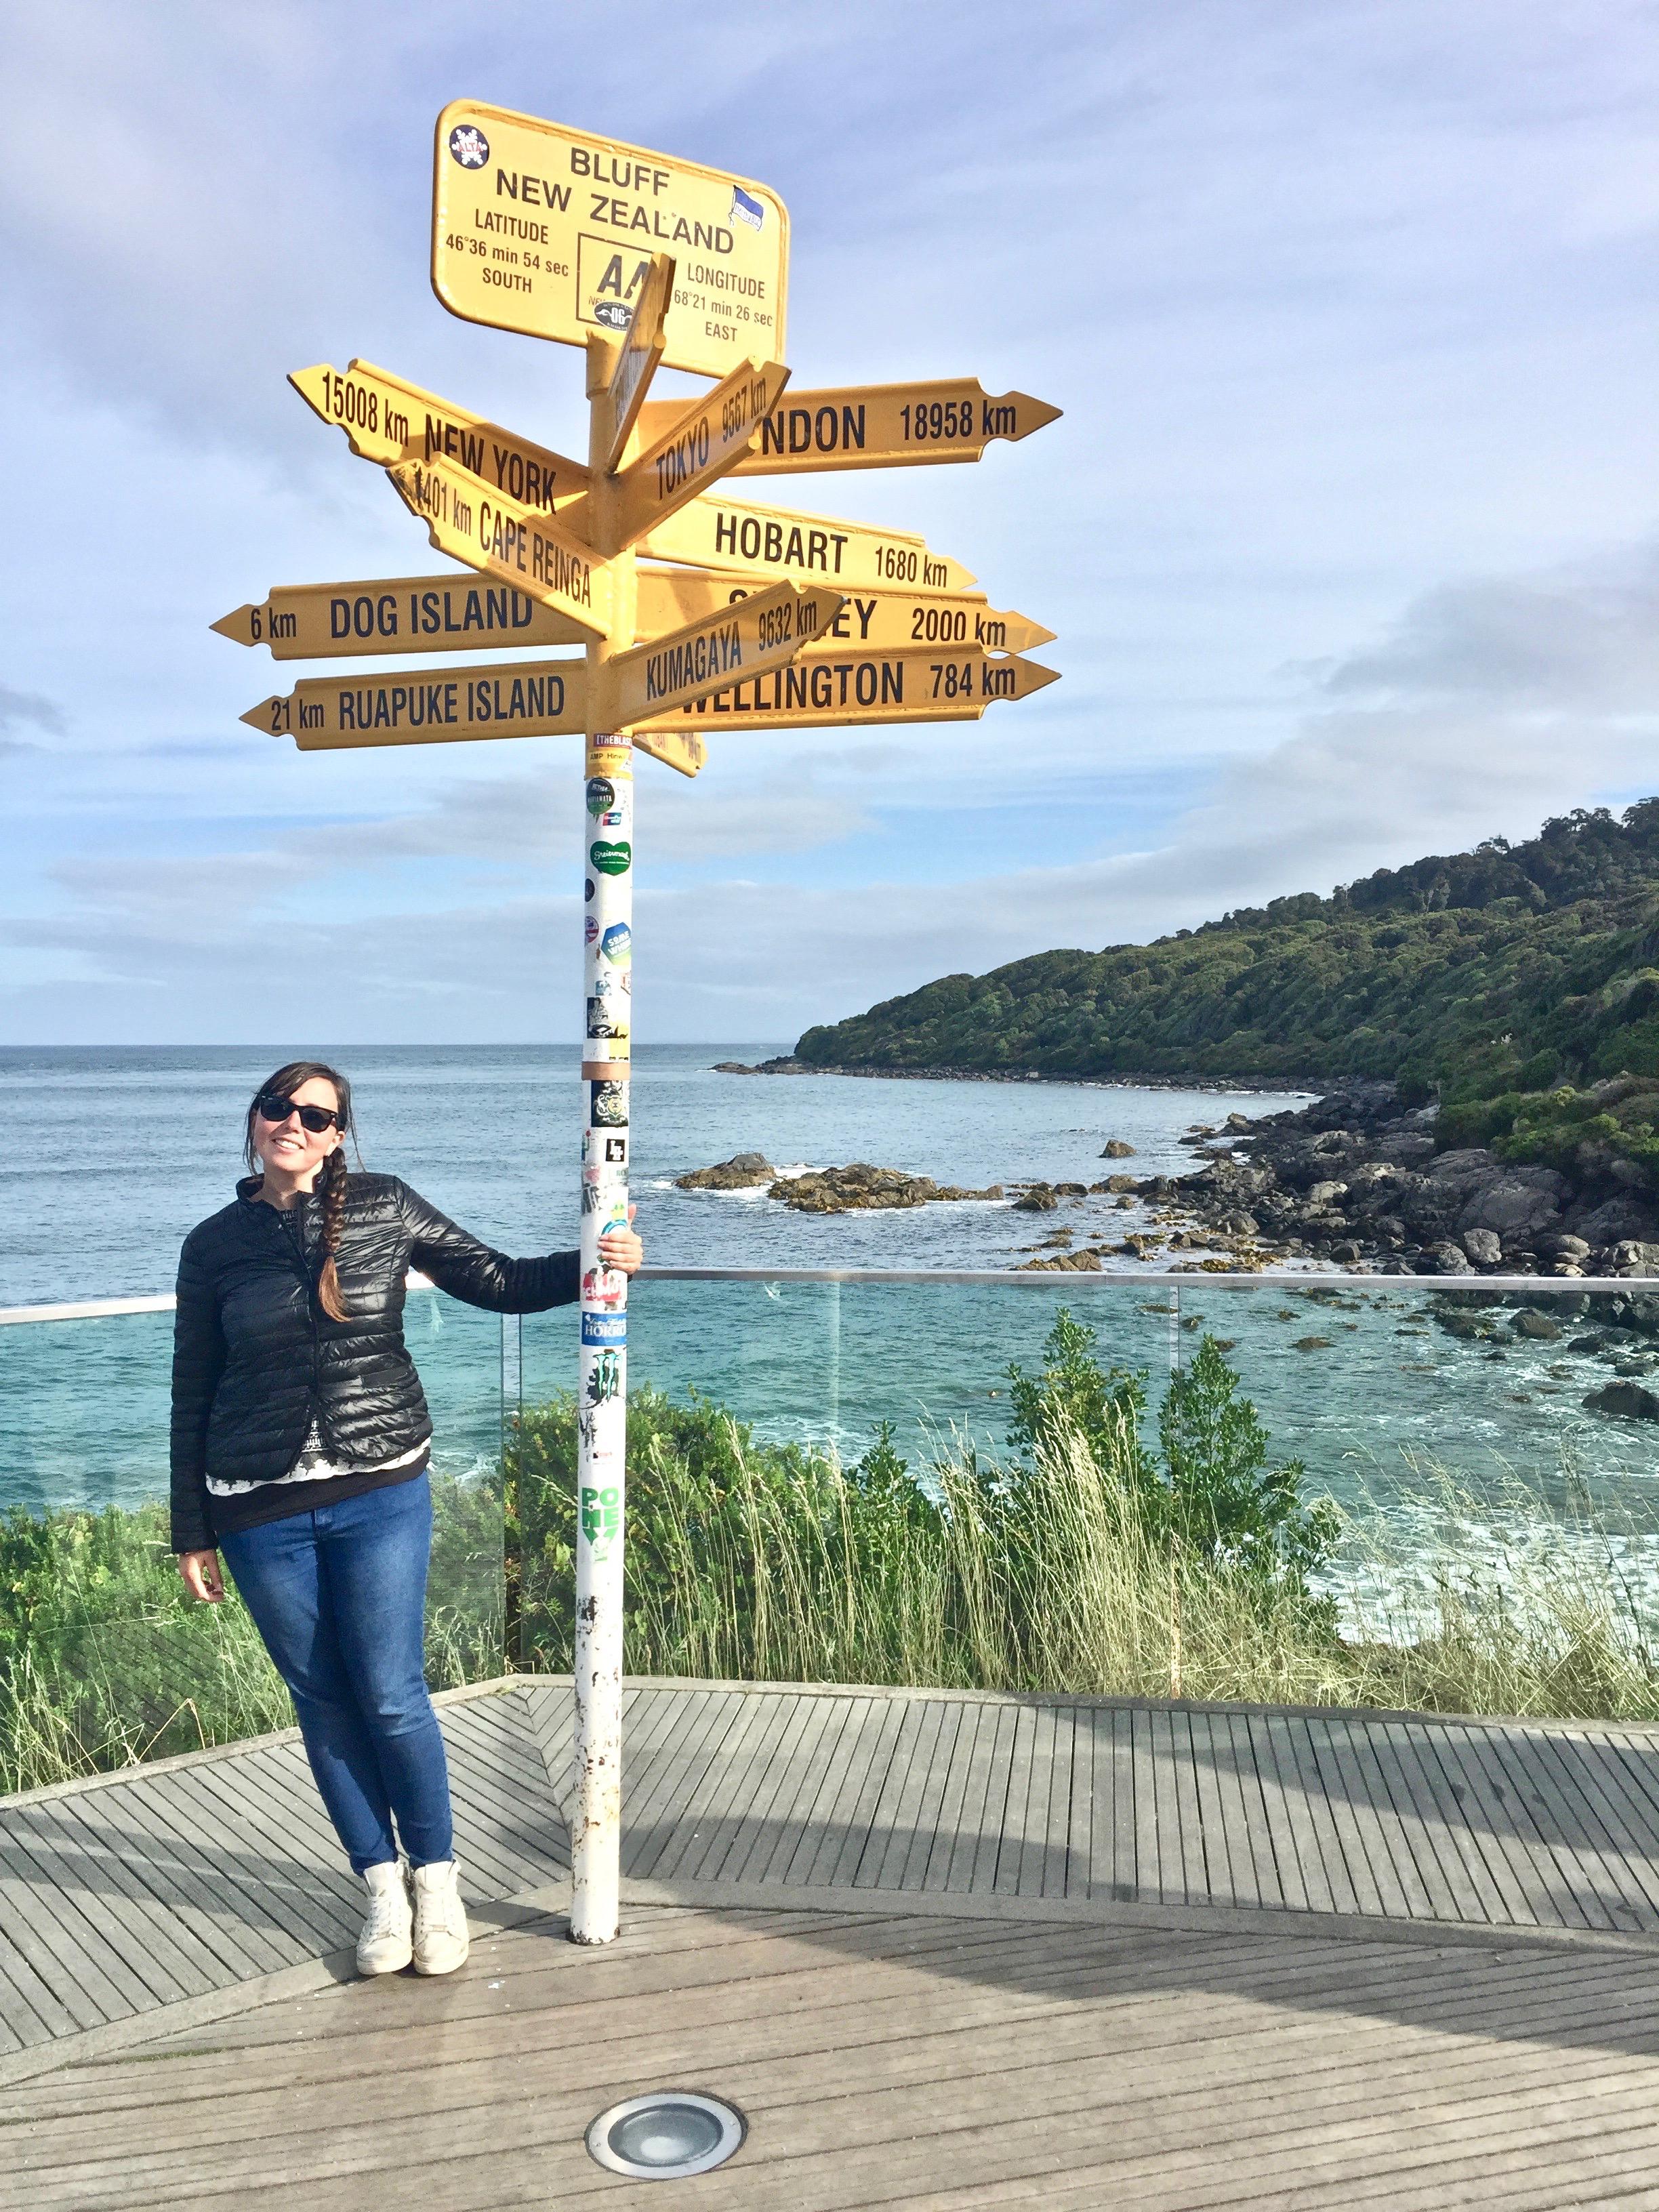 festeggiare in viaggio - Nuova Zelanda